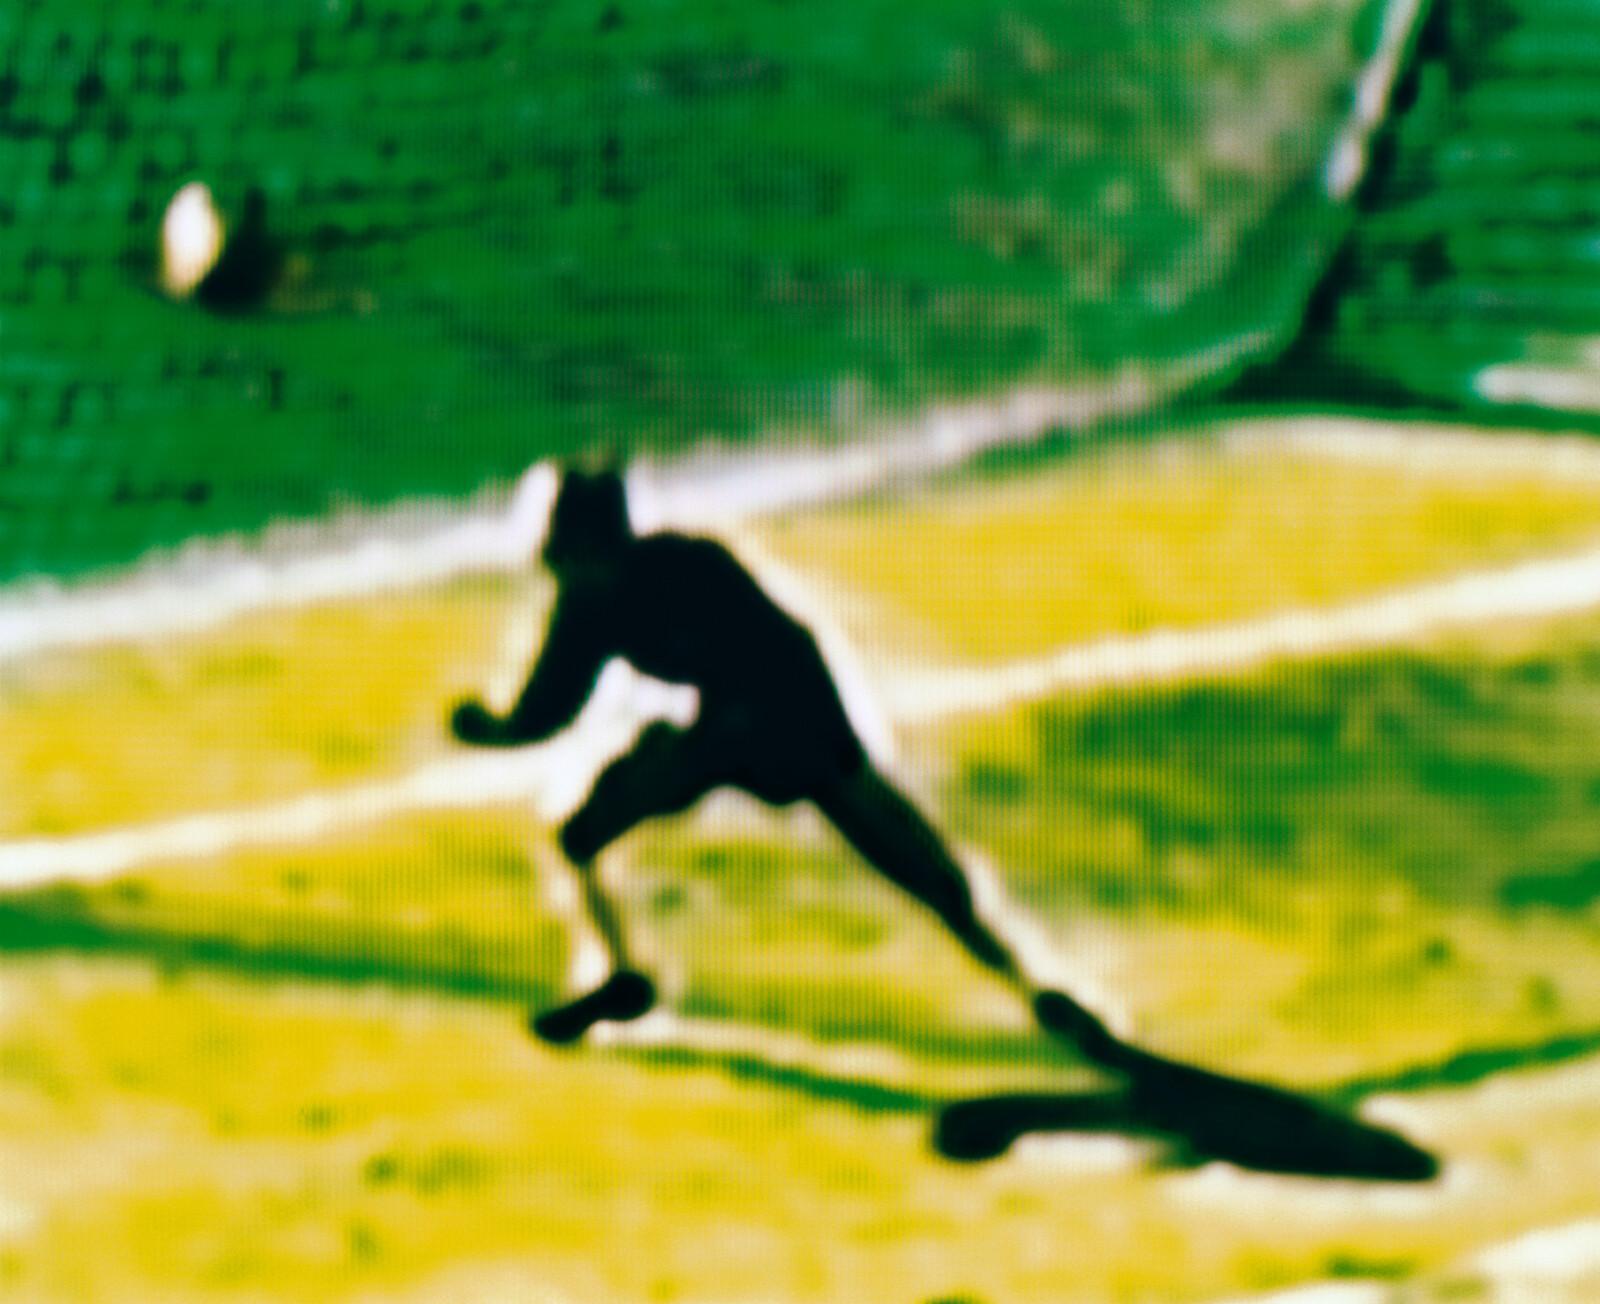 Hans Tilkowski England v West Germany 4-2 AET (Final) 30.06.1966, Wembley London, England - Robert Davies